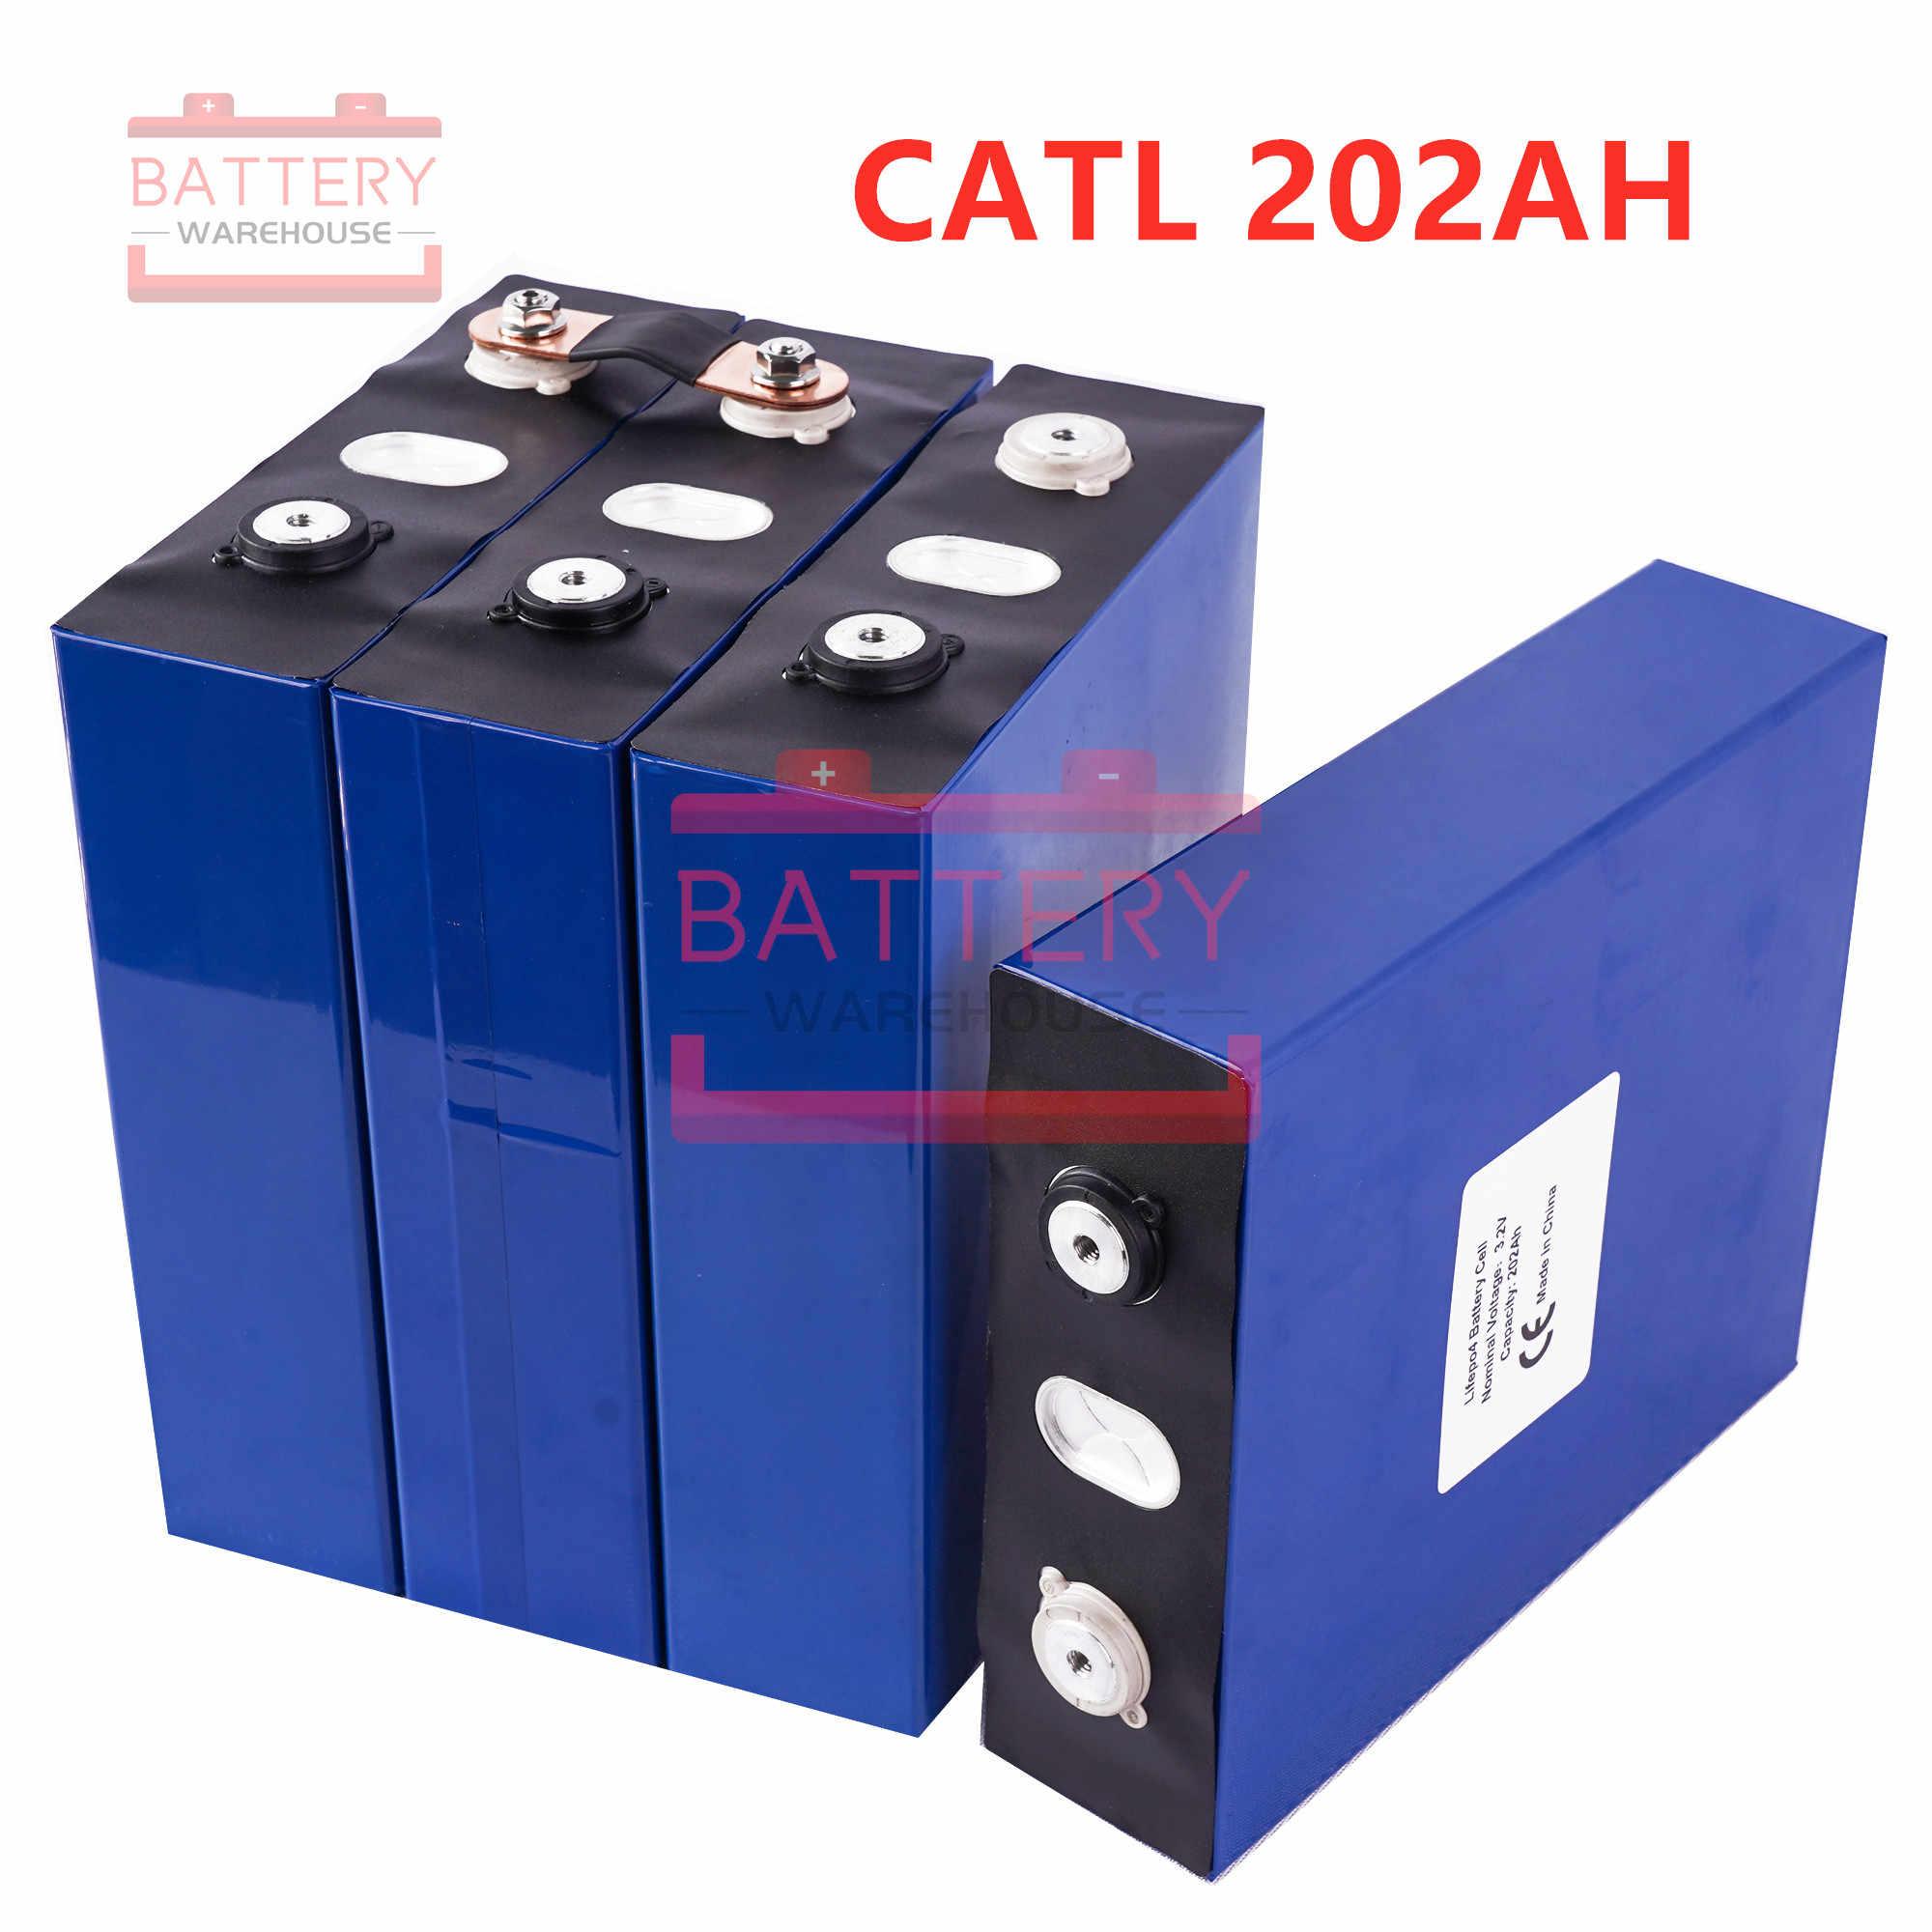 "8PCS CATL LIFEPO4 סוללה 3.2v200AH 2019 חדש נטענת סוללות תא עבור 24V200AH עבור RV שמש EV ימי האיחוד האירופי בארה""ב מס מע""מ משלוח"